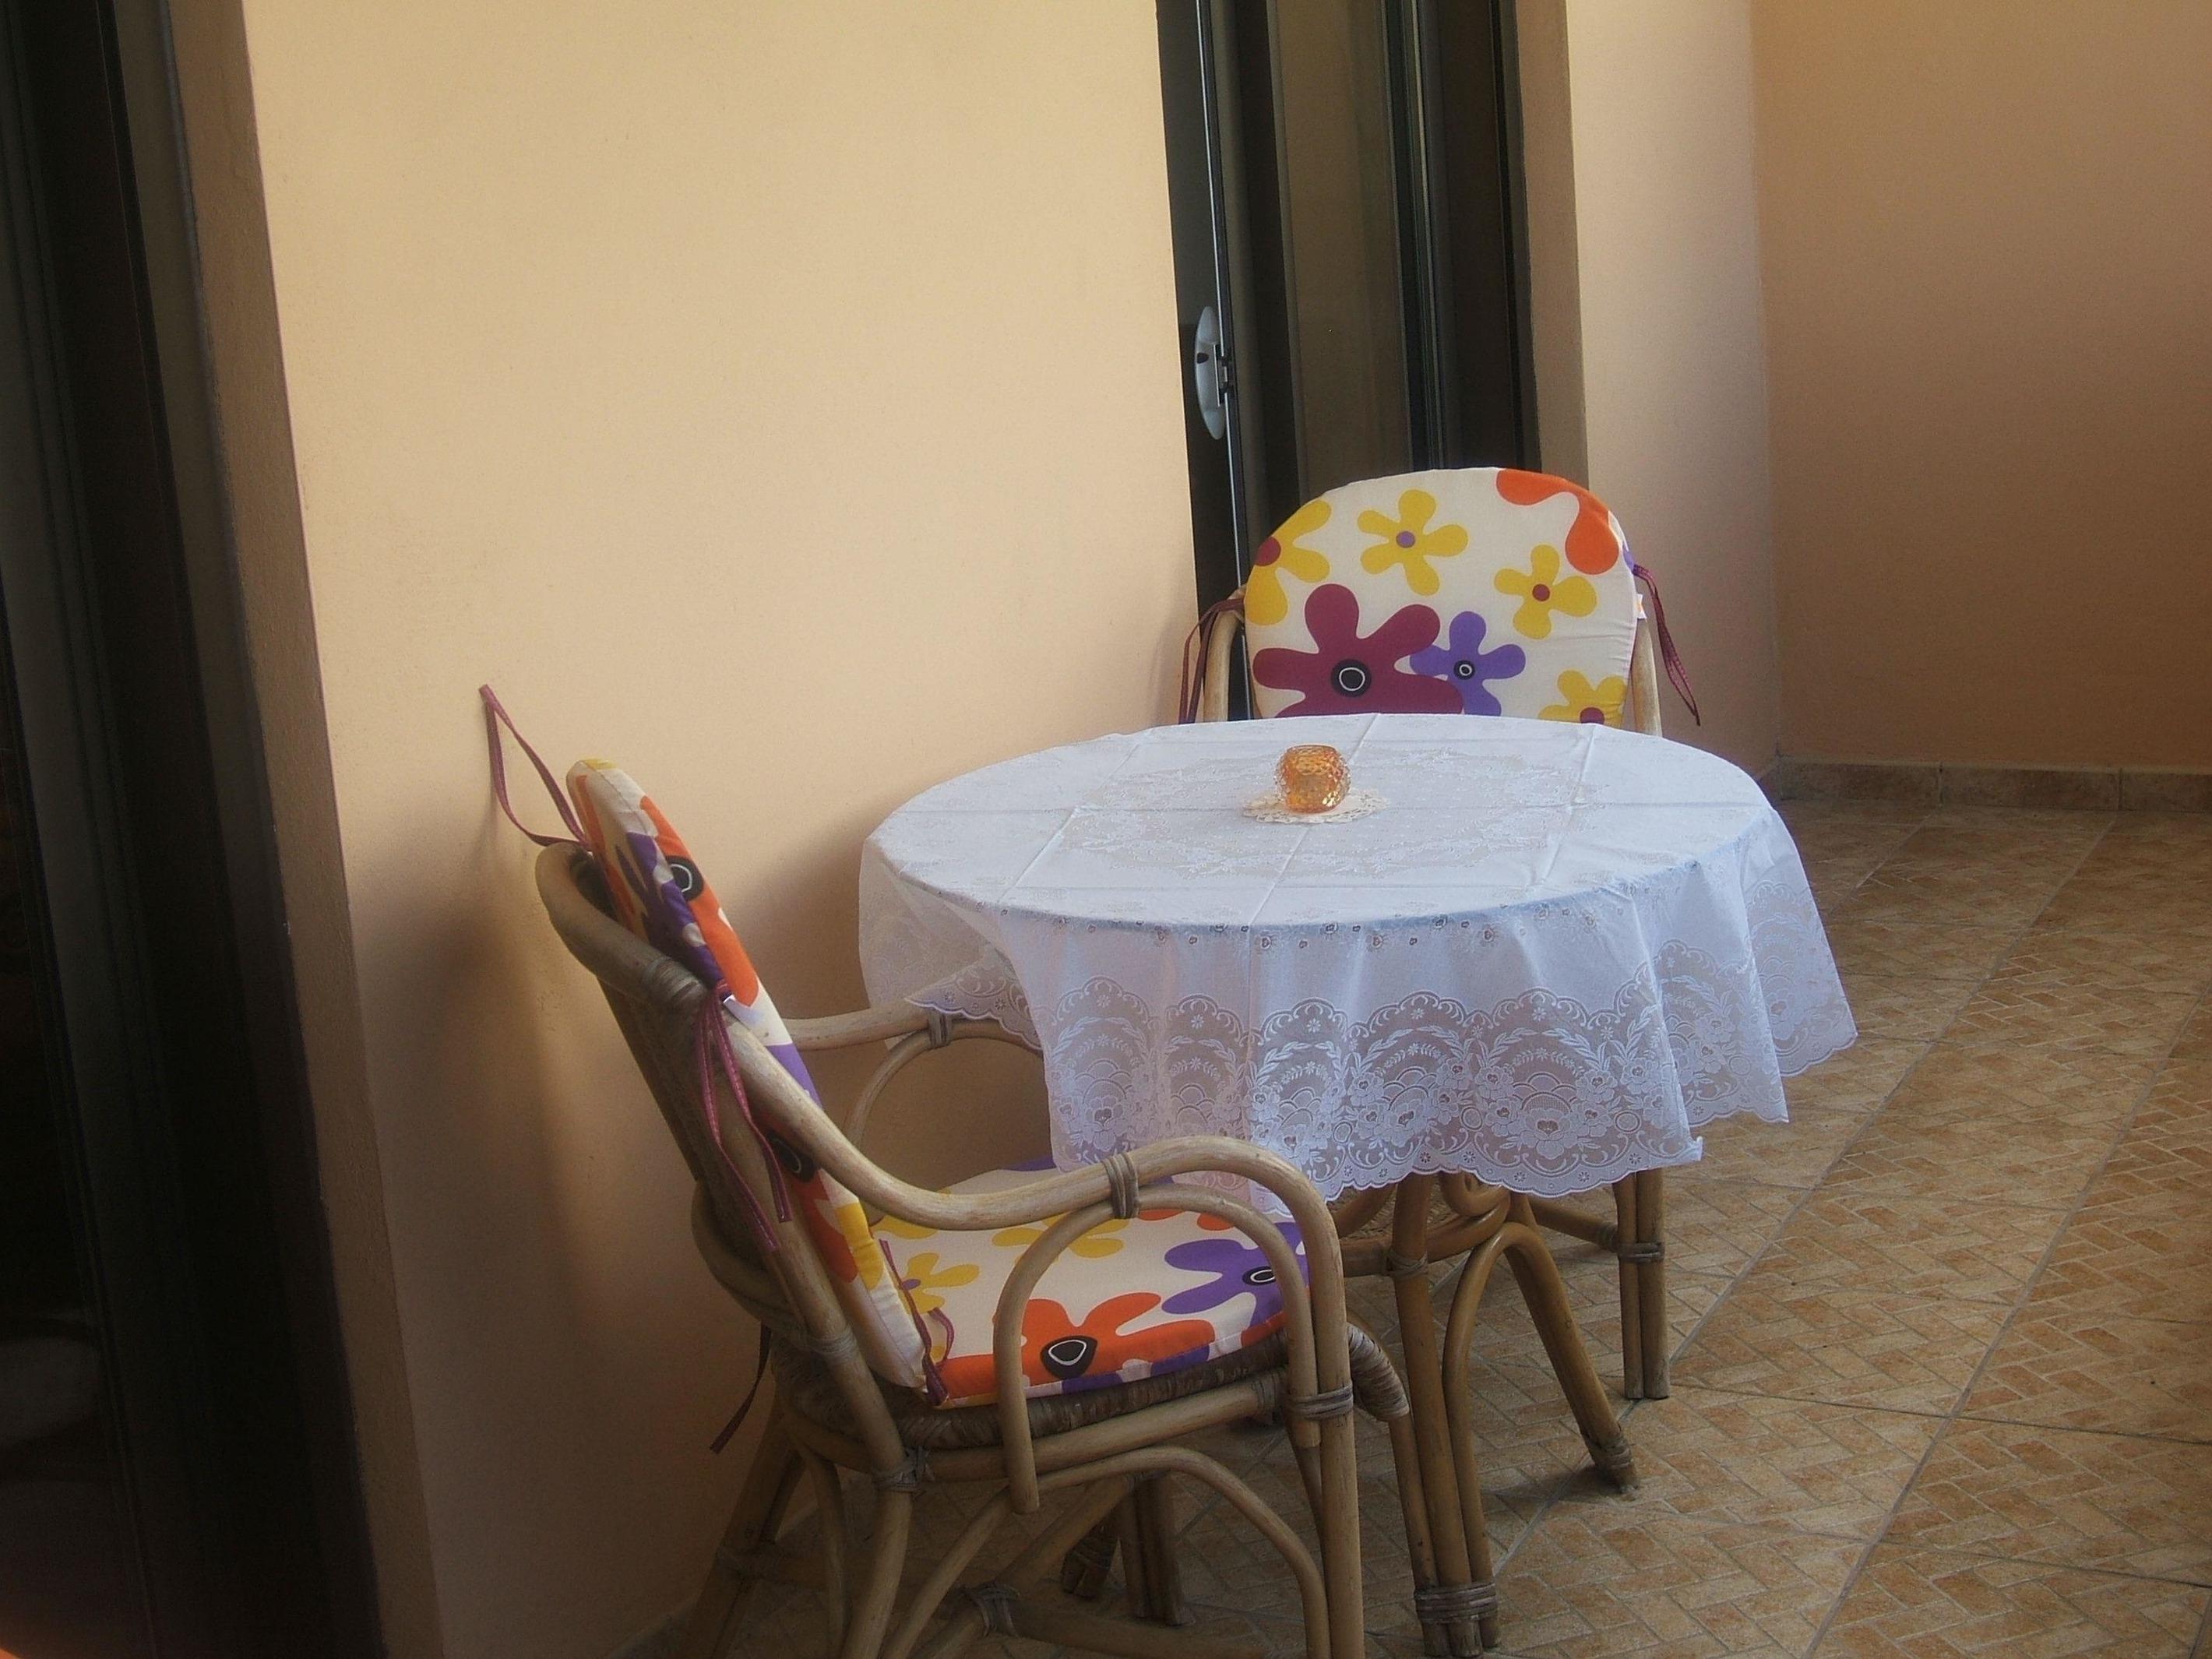 Appartement de vacances Fewo Mar y Teide Romantico, grosszügig, mit 2 Terrassen, Pool, Parkplatz,  Sicht auf Meer  (2492990), Puerto de la Cruz, Ténérife, Iles Canaries, Espagne, image 24